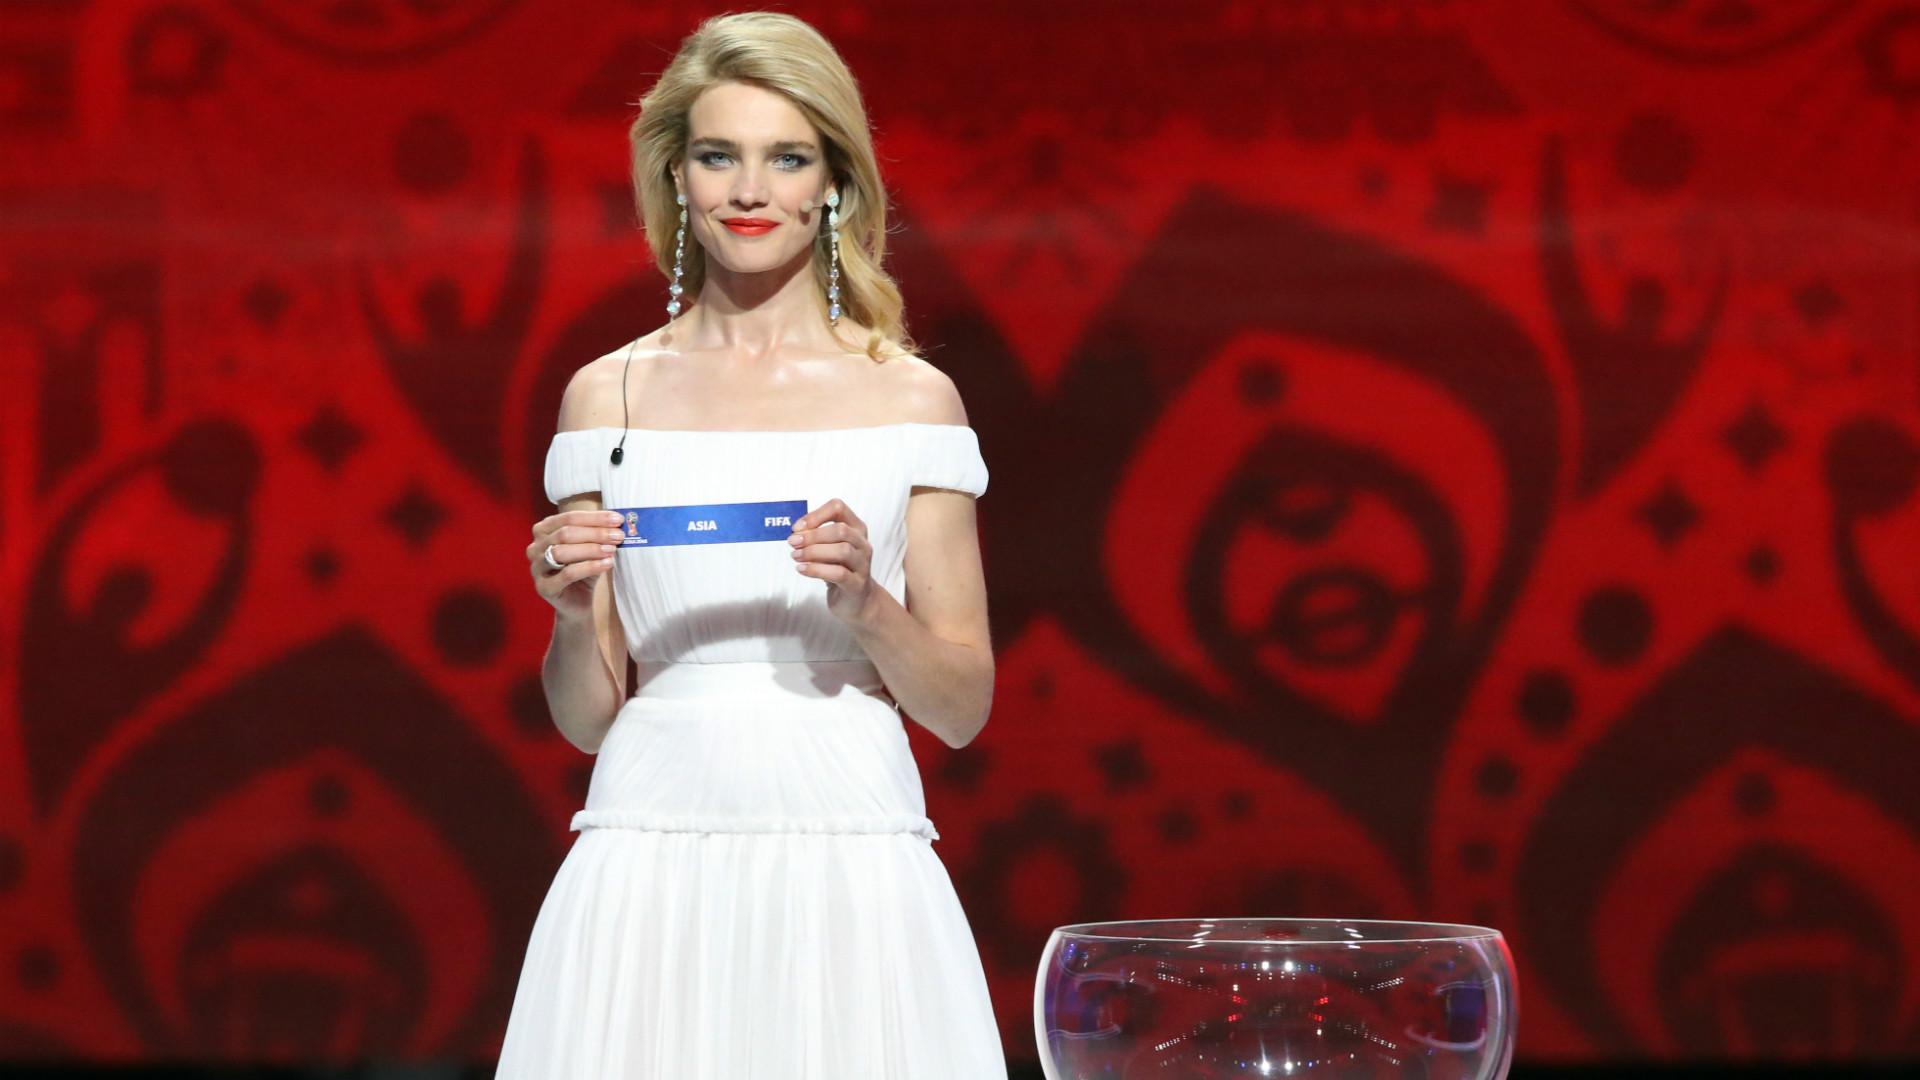 Natalia Vodianova FIFA World Cup Qualification Draw